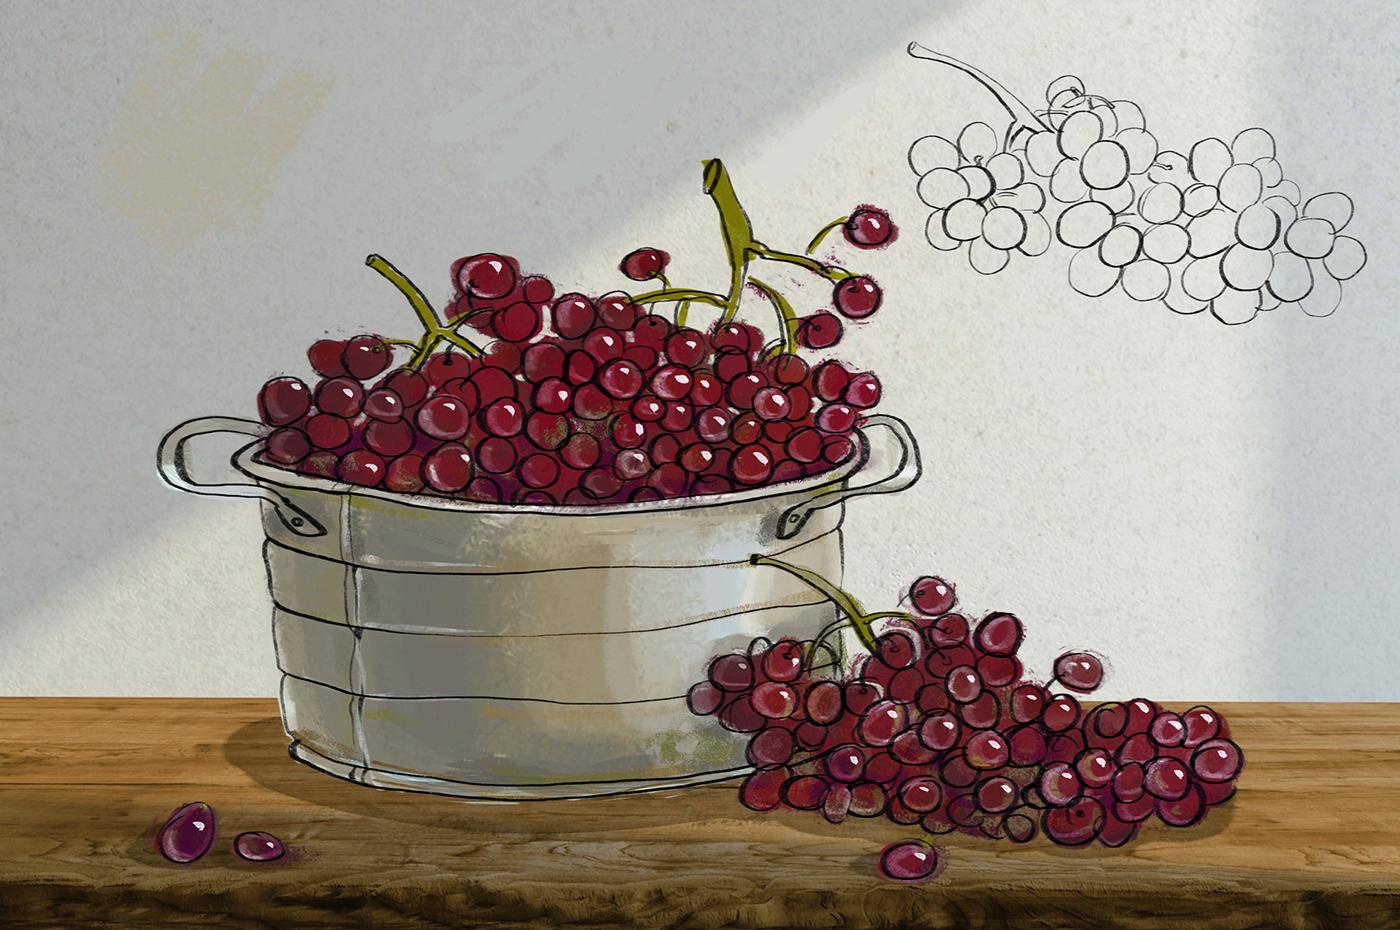 cinema 4d wine bottle stopper glass heart wood Pack bolimond blood grapes